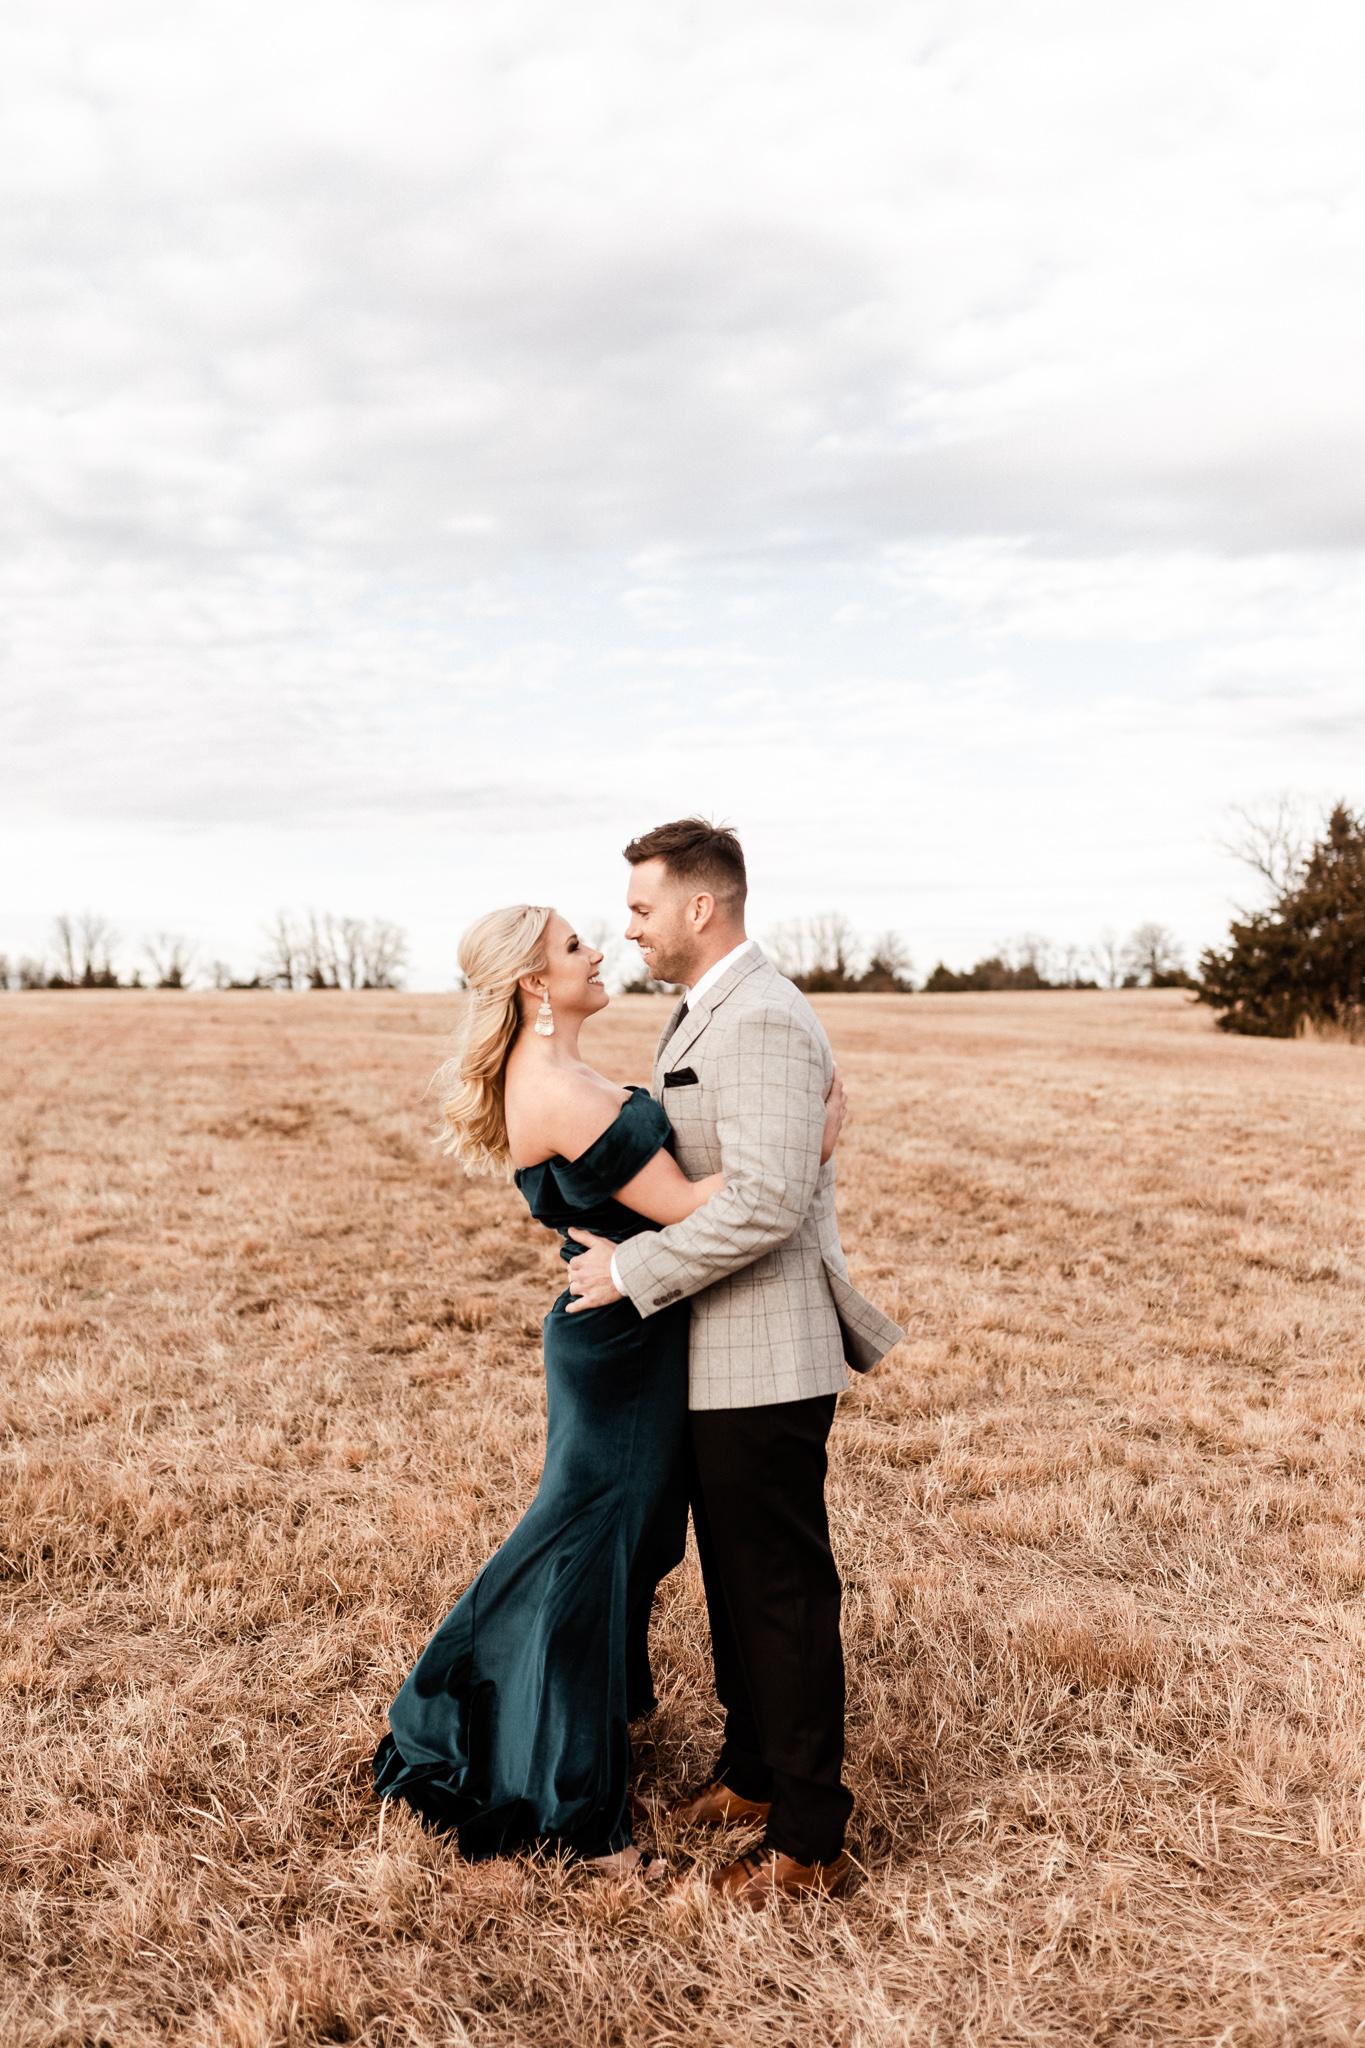 Wade + Stephanie | Warm Open Field Engagements | Oklahoma Wedding Photographer-4.jpg